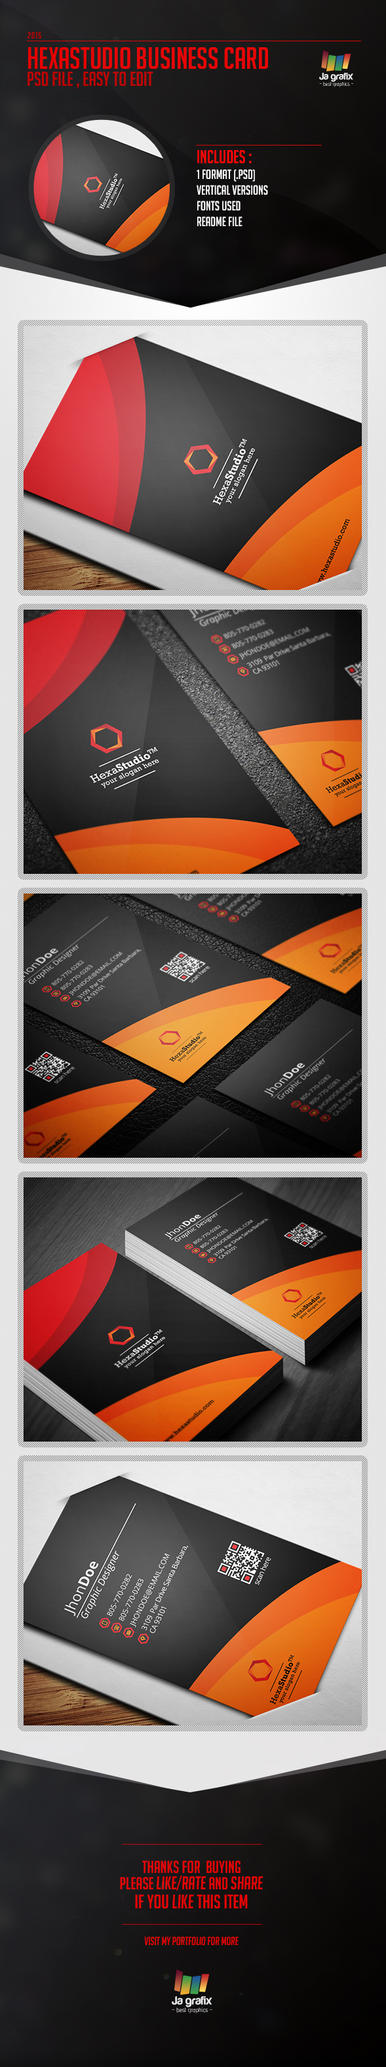 HexaStudio Business Card [PSD] by Ja-Ghraphics